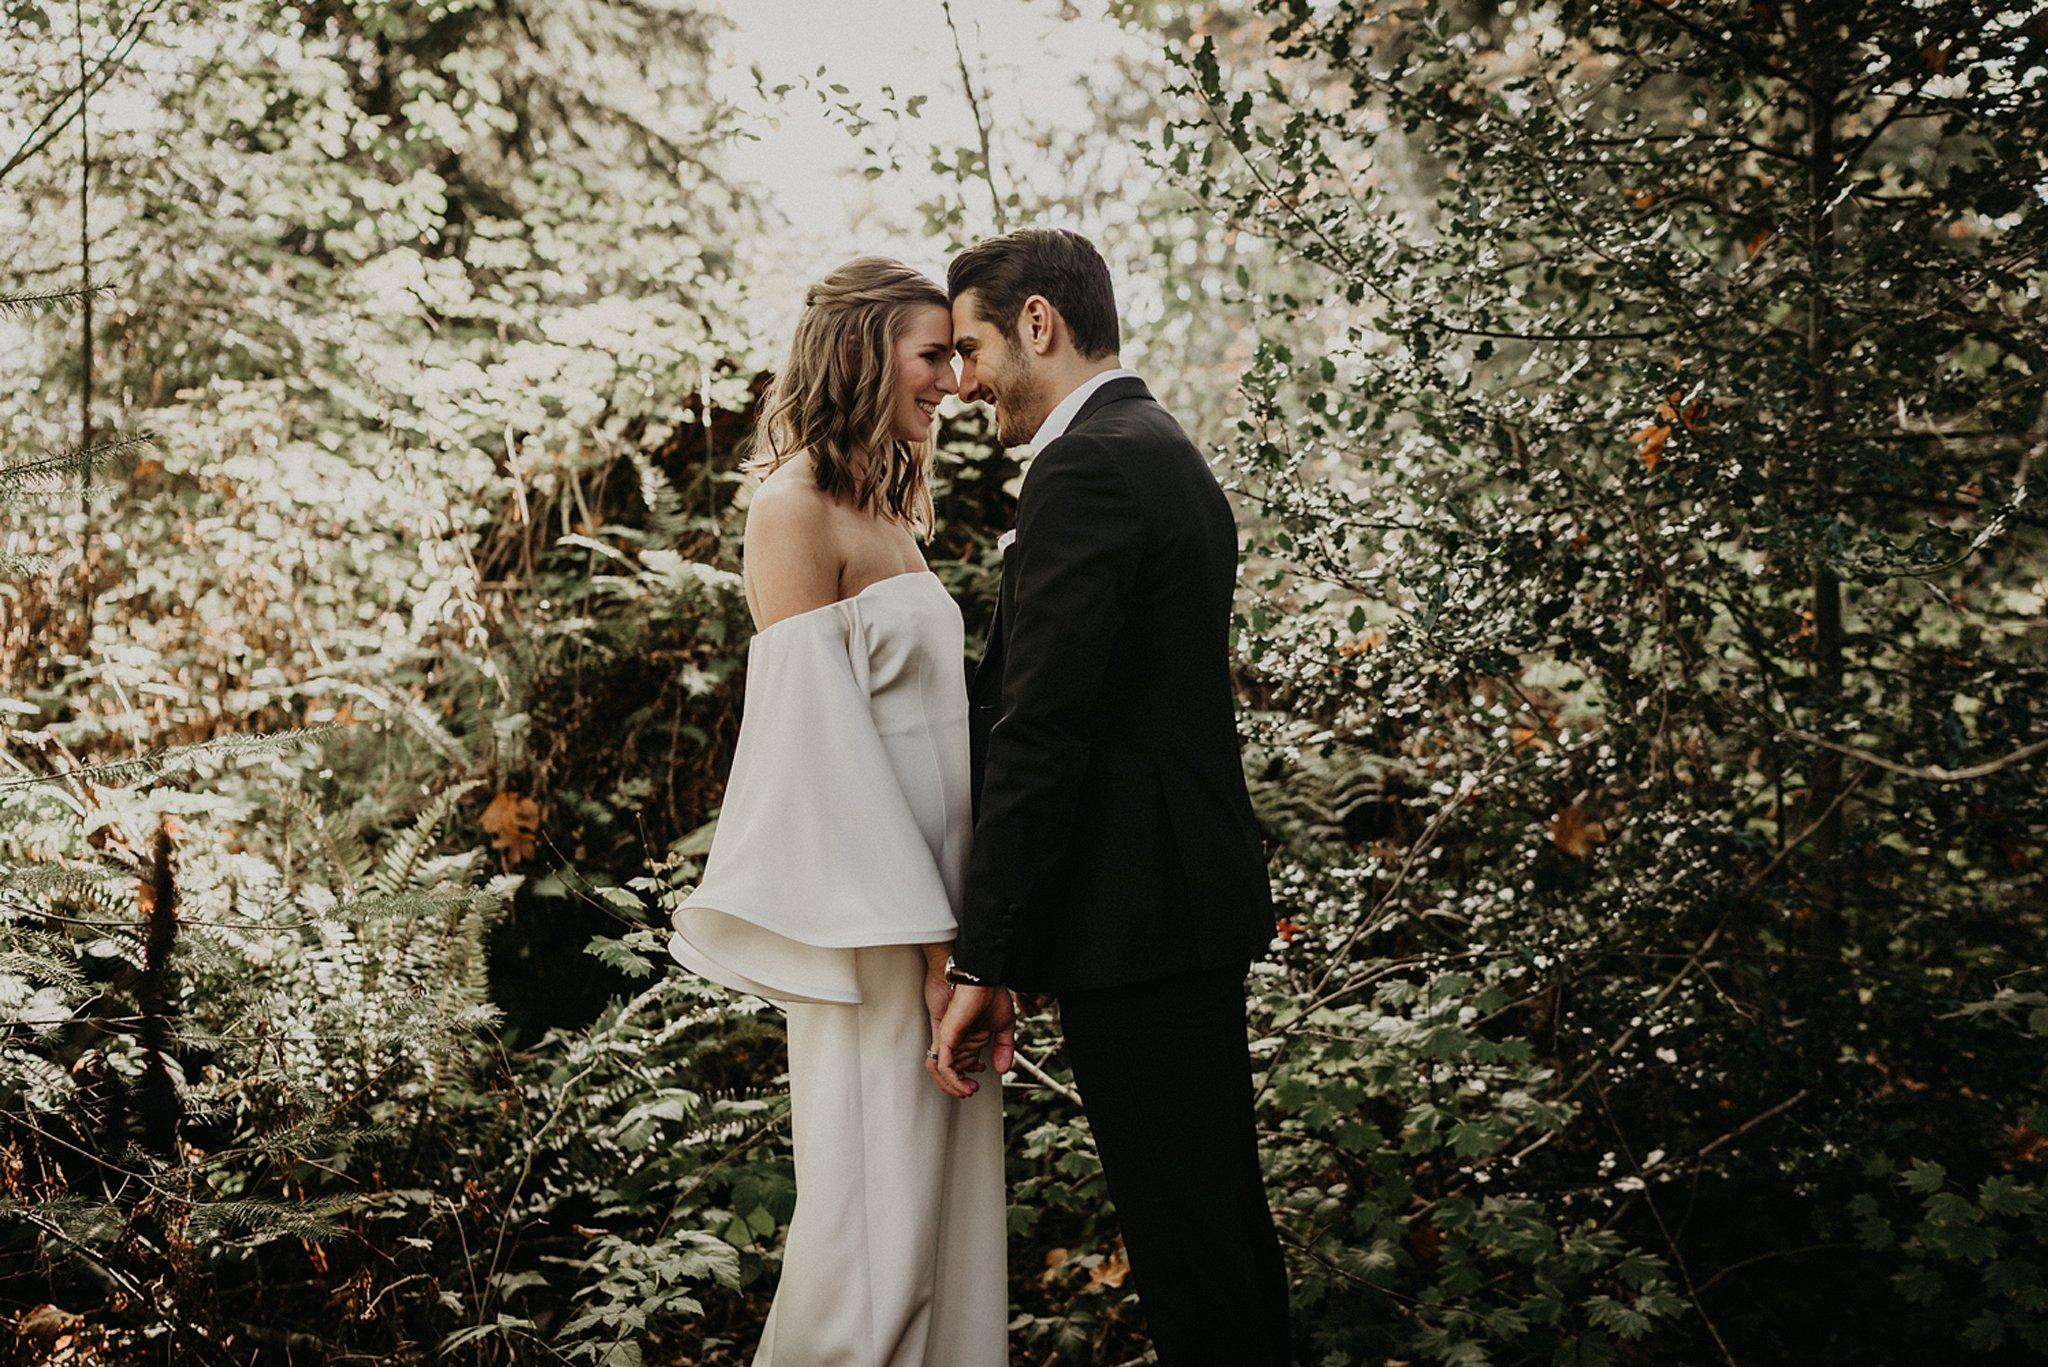 Seattle-intimate-elopement_0001.jpg